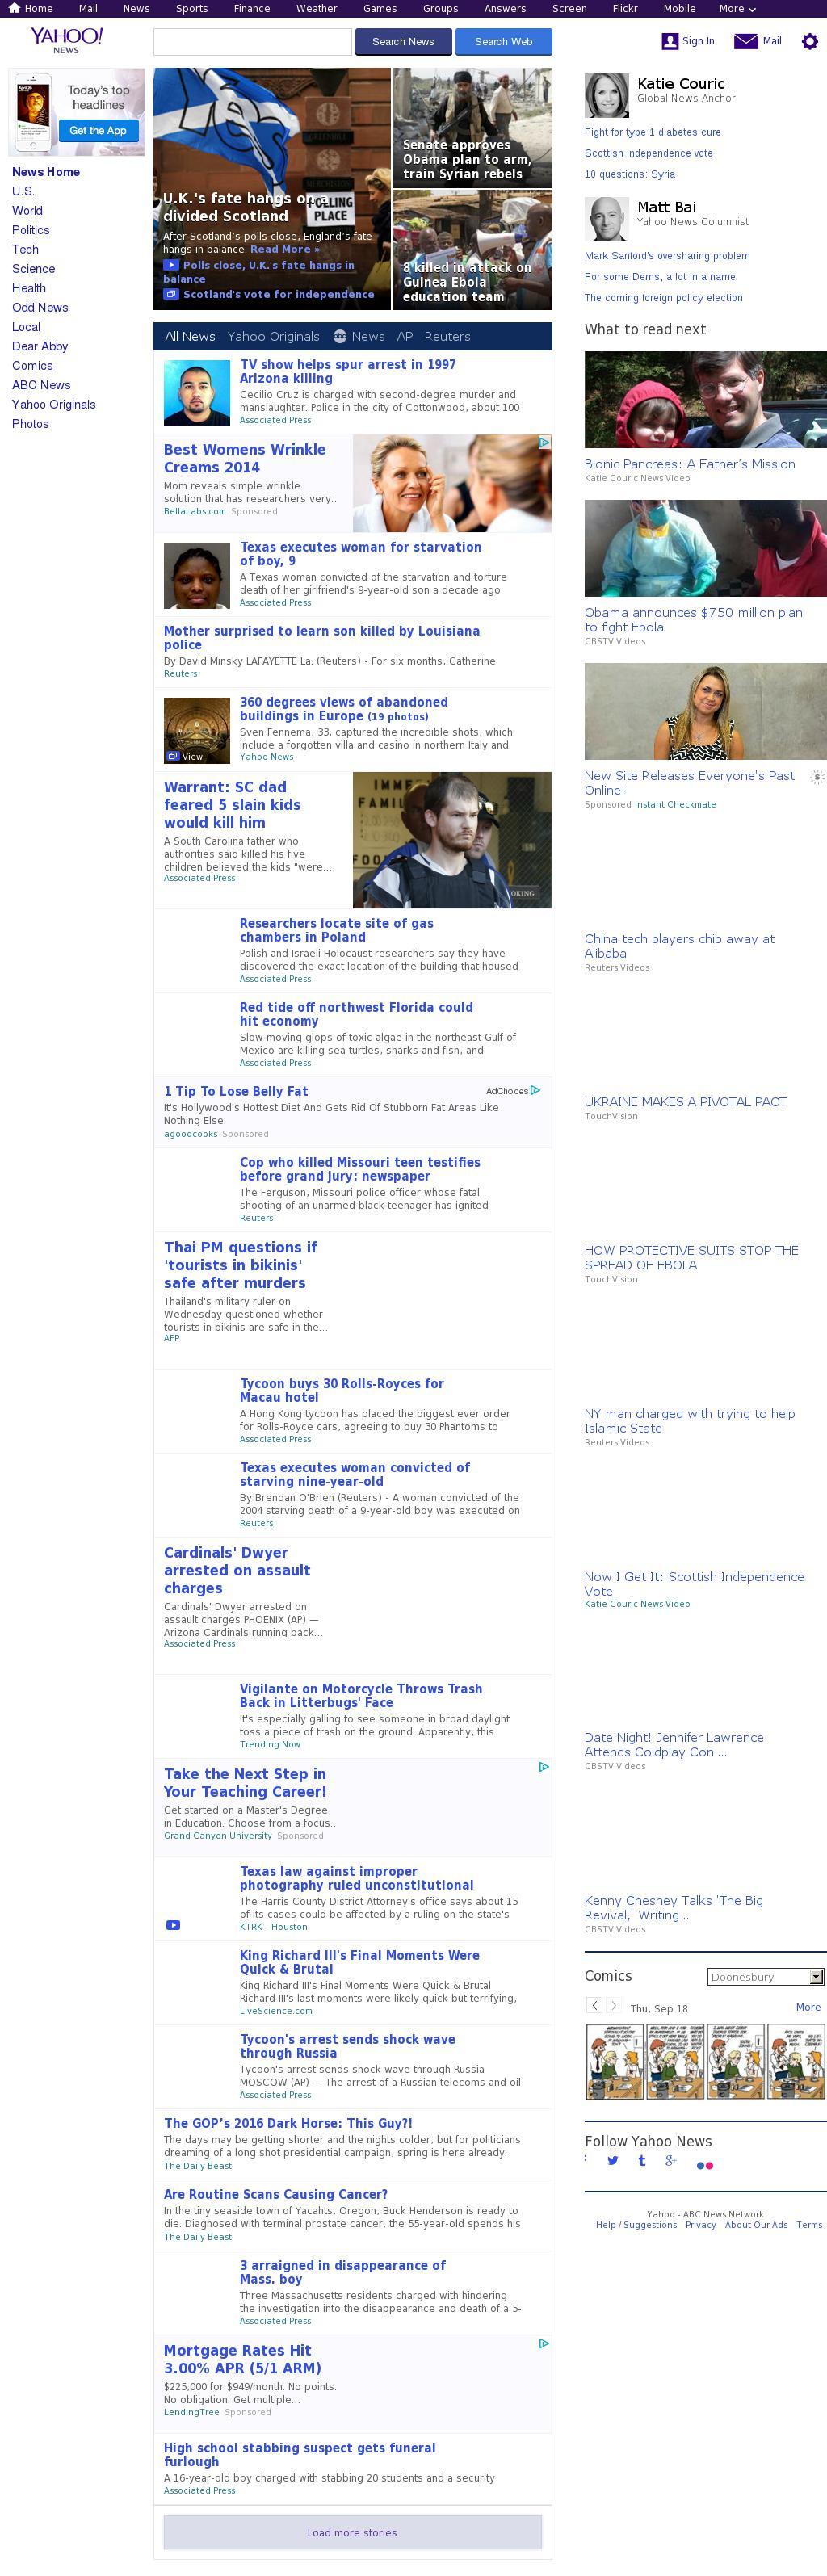 Yahoo! News at Thursday Sept. 18, 2014, 11:23 p.m. UTC